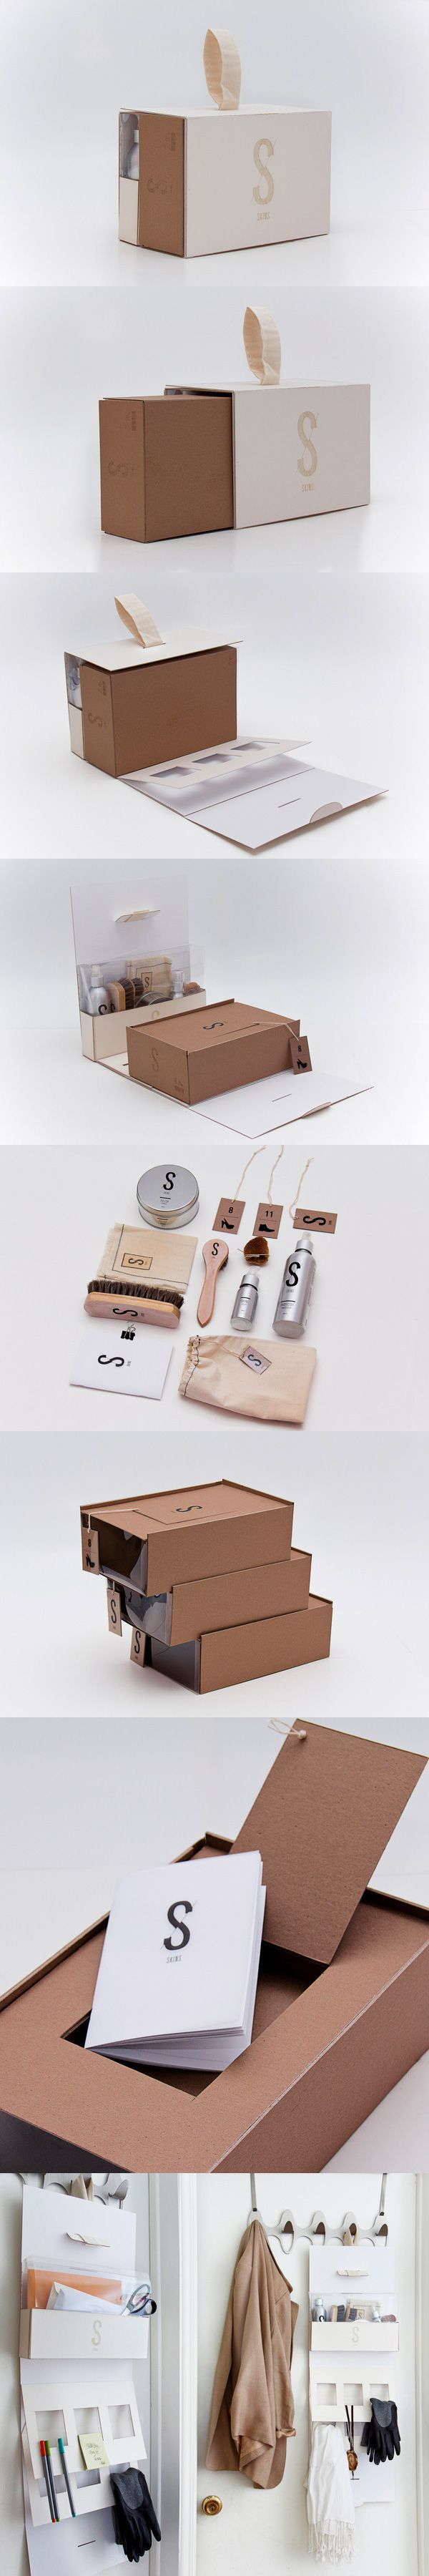 "SKINS Shoe ""Box""/Organizer Concept by Jiani Lu | Packaging of the World"